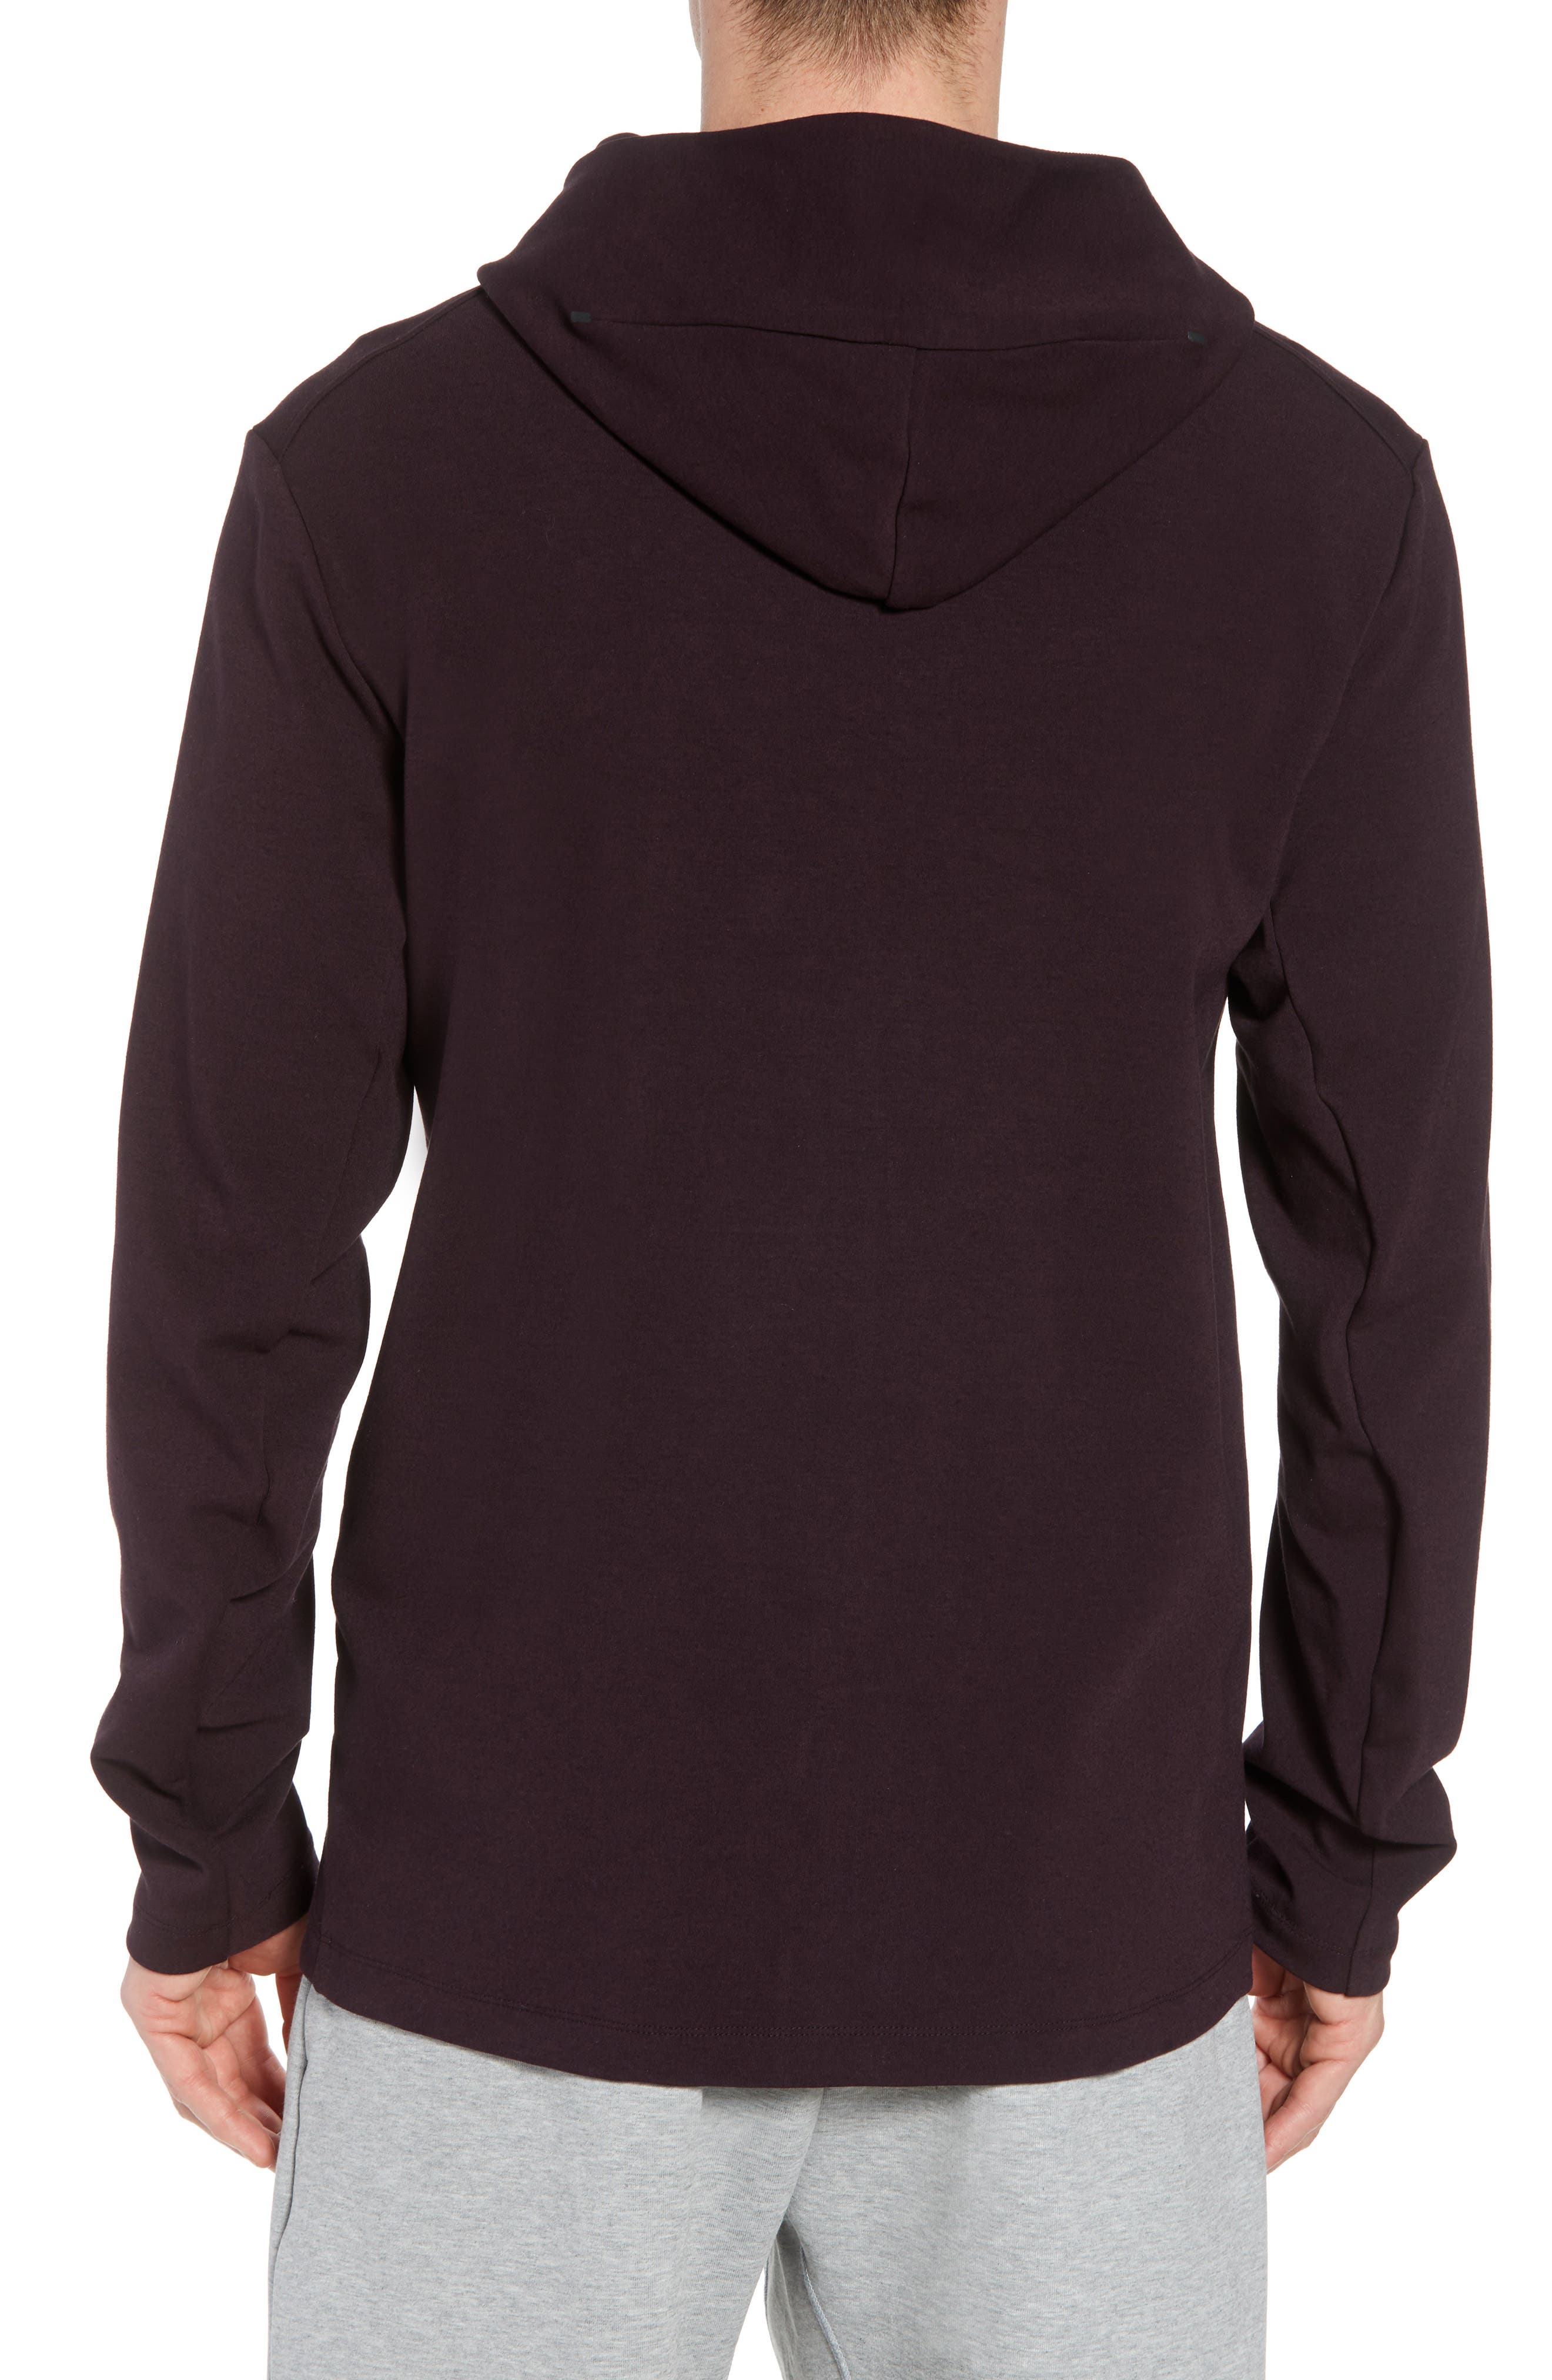 NIKE,                             Sportswear Tech Full Zip Hoodie,                             Alternate thumbnail 2, color,                             010